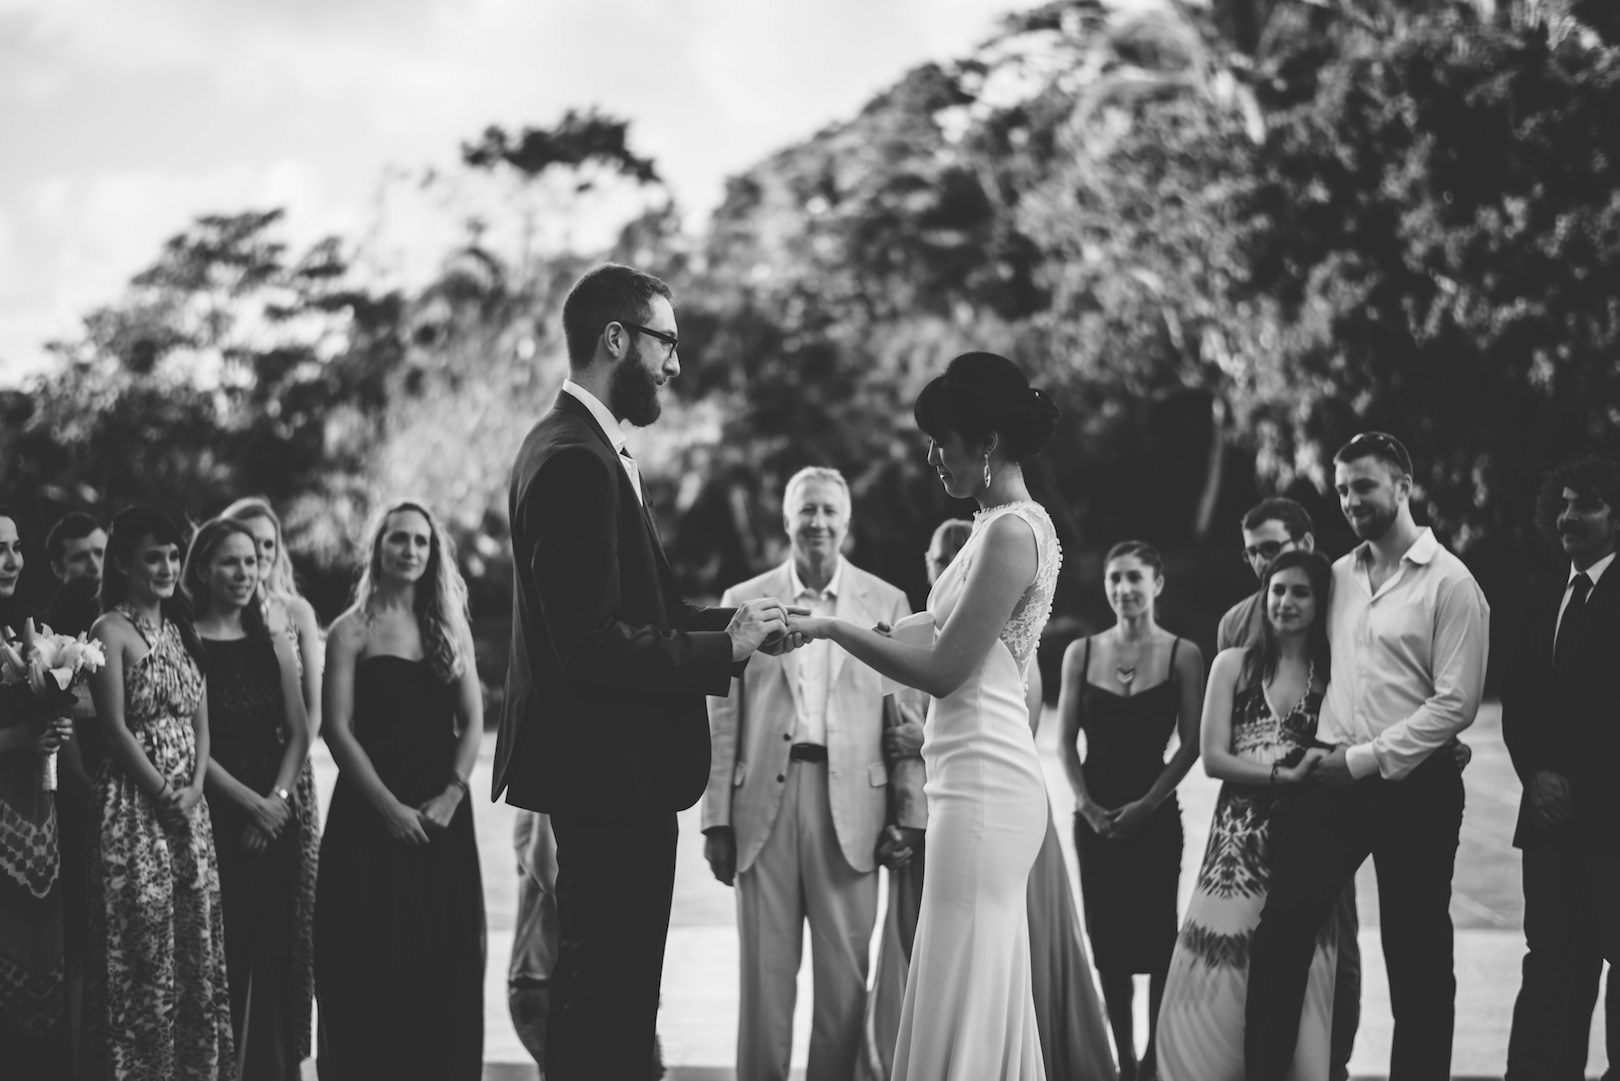 Nathan & Felicia - Wedding Day - © Dallas Kolotylo Photography - 343